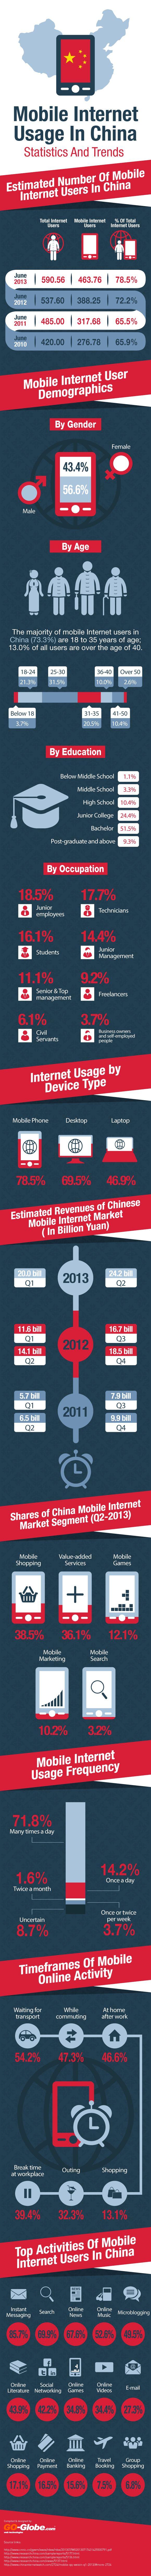 China Mobile Internet Usage Statistics